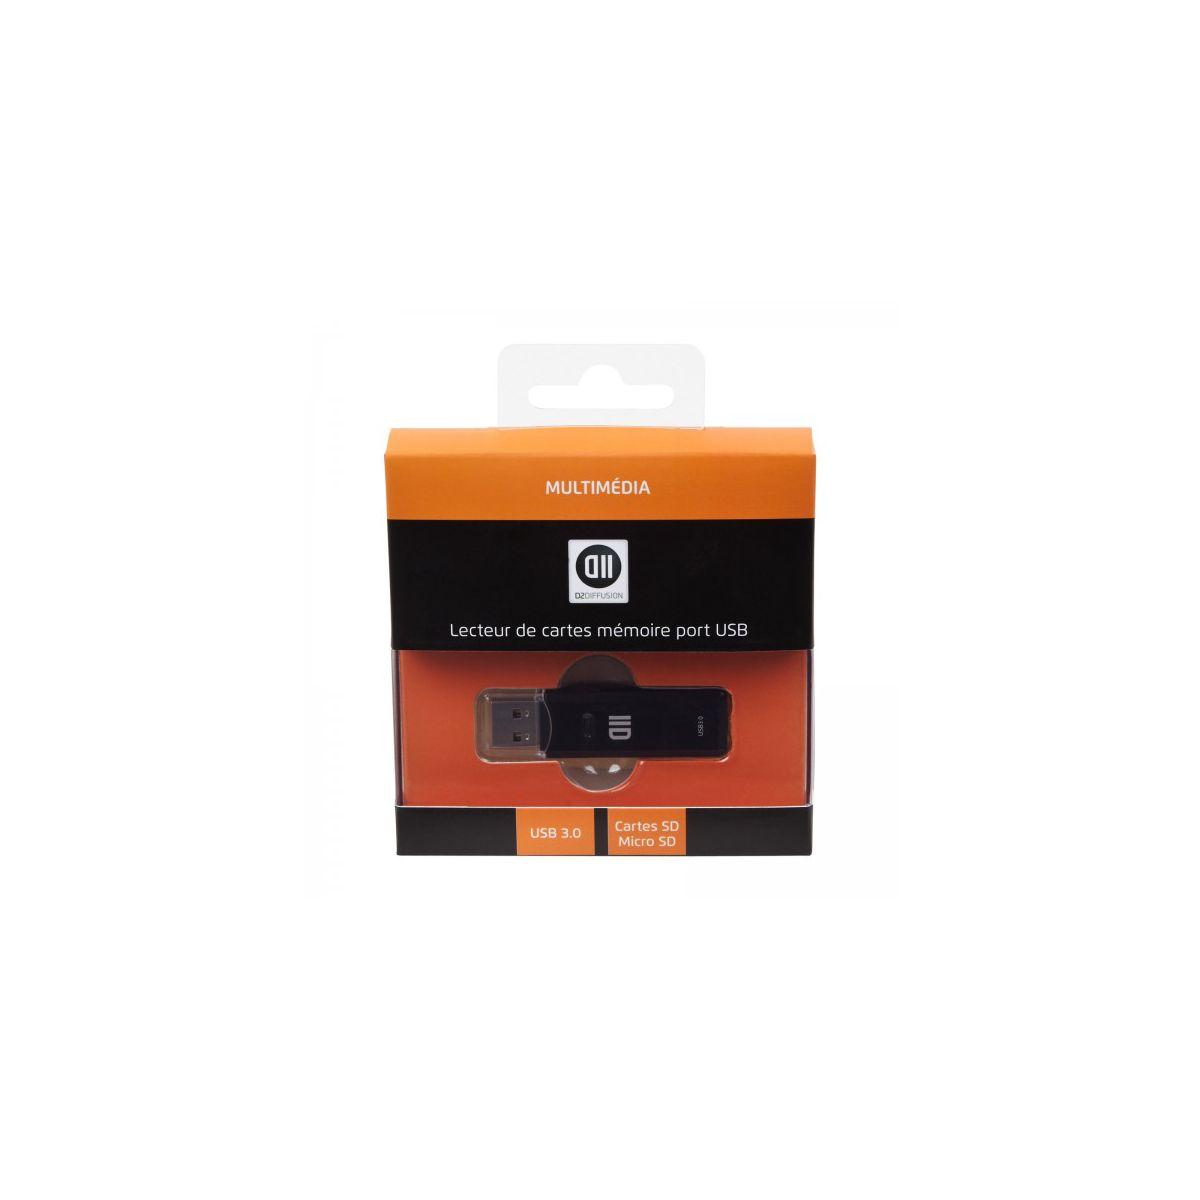 Lecteur de carte mémoire D2 SD micro SD port micro USB 3.0 (photo)